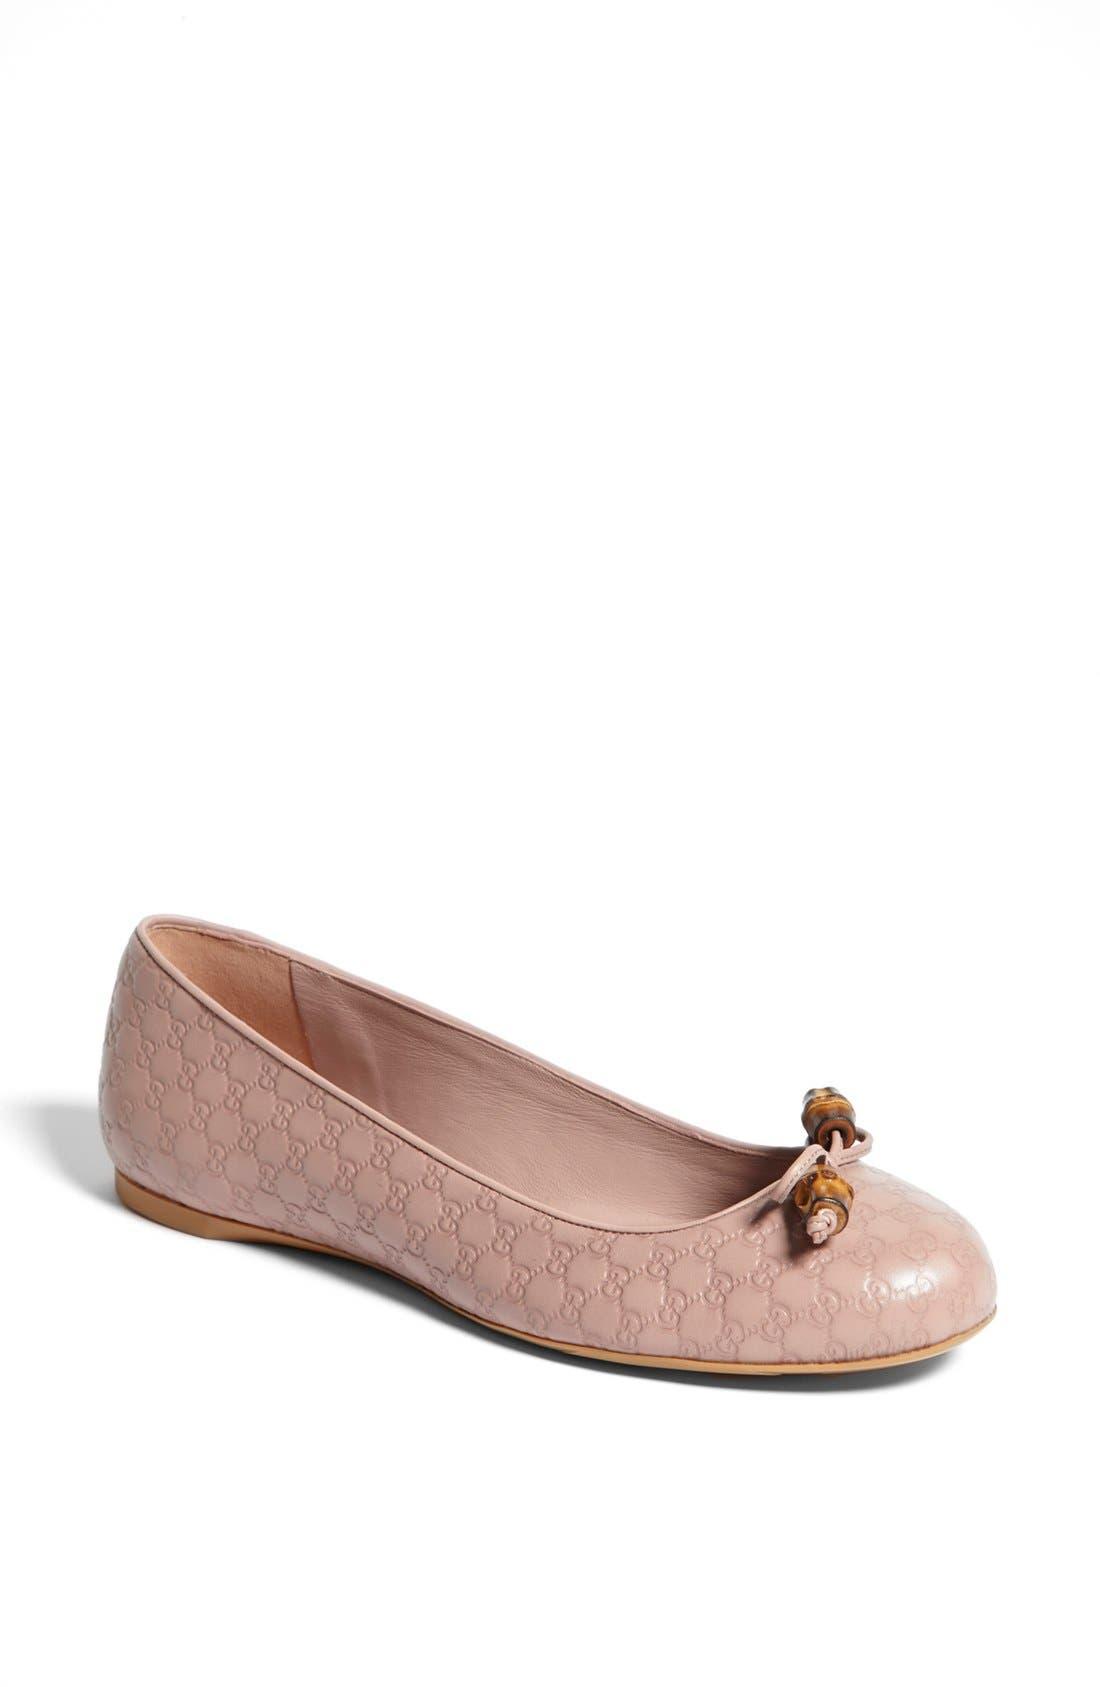 Alternate Image 1 Selected - Gucci 'Sylvie' Bamboo Bow Ballet Flat